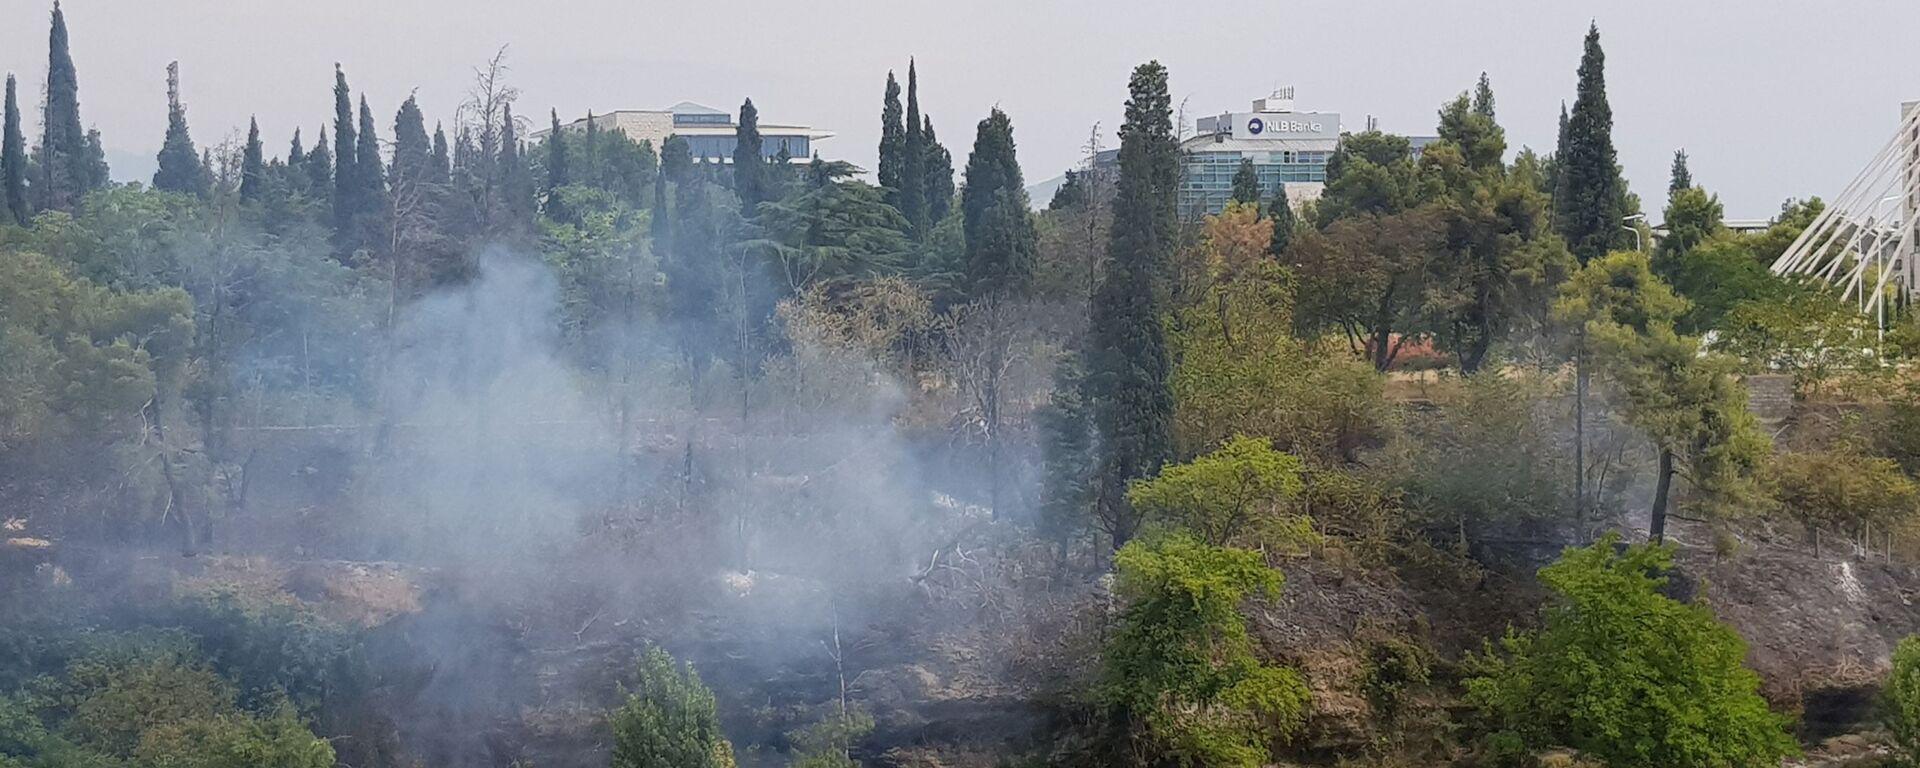 Пожар у Подгорици - Sputnik Србија, 1920, 29.07.2021